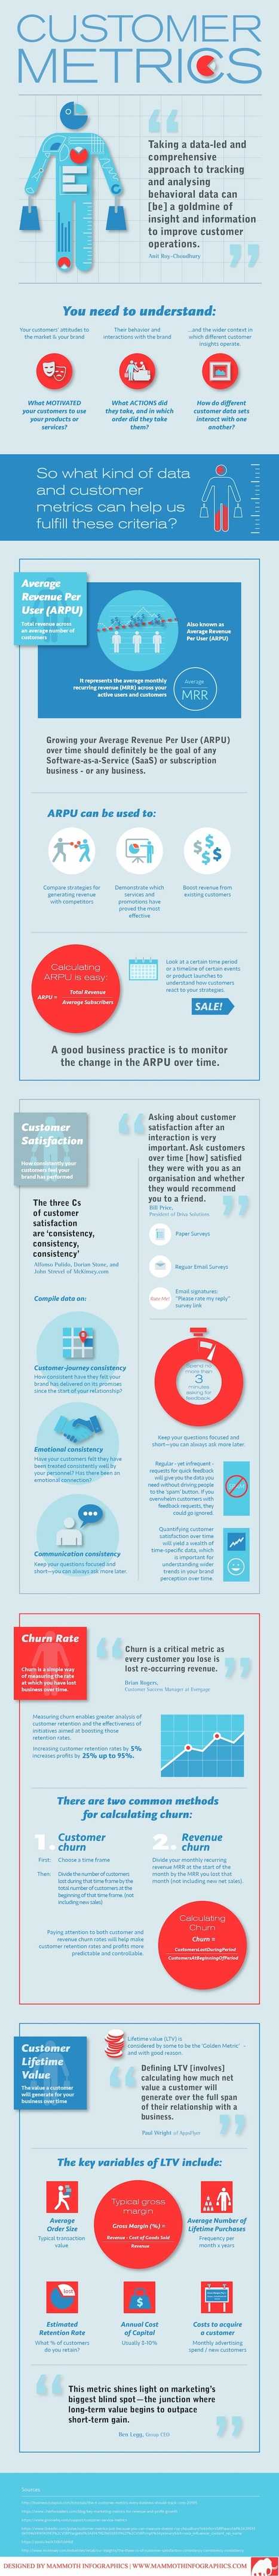 Key Customer Metrics You Need to be Tracking (Infographic) - Kissmetrics | Modern Marketing Revolution | Scoop.it